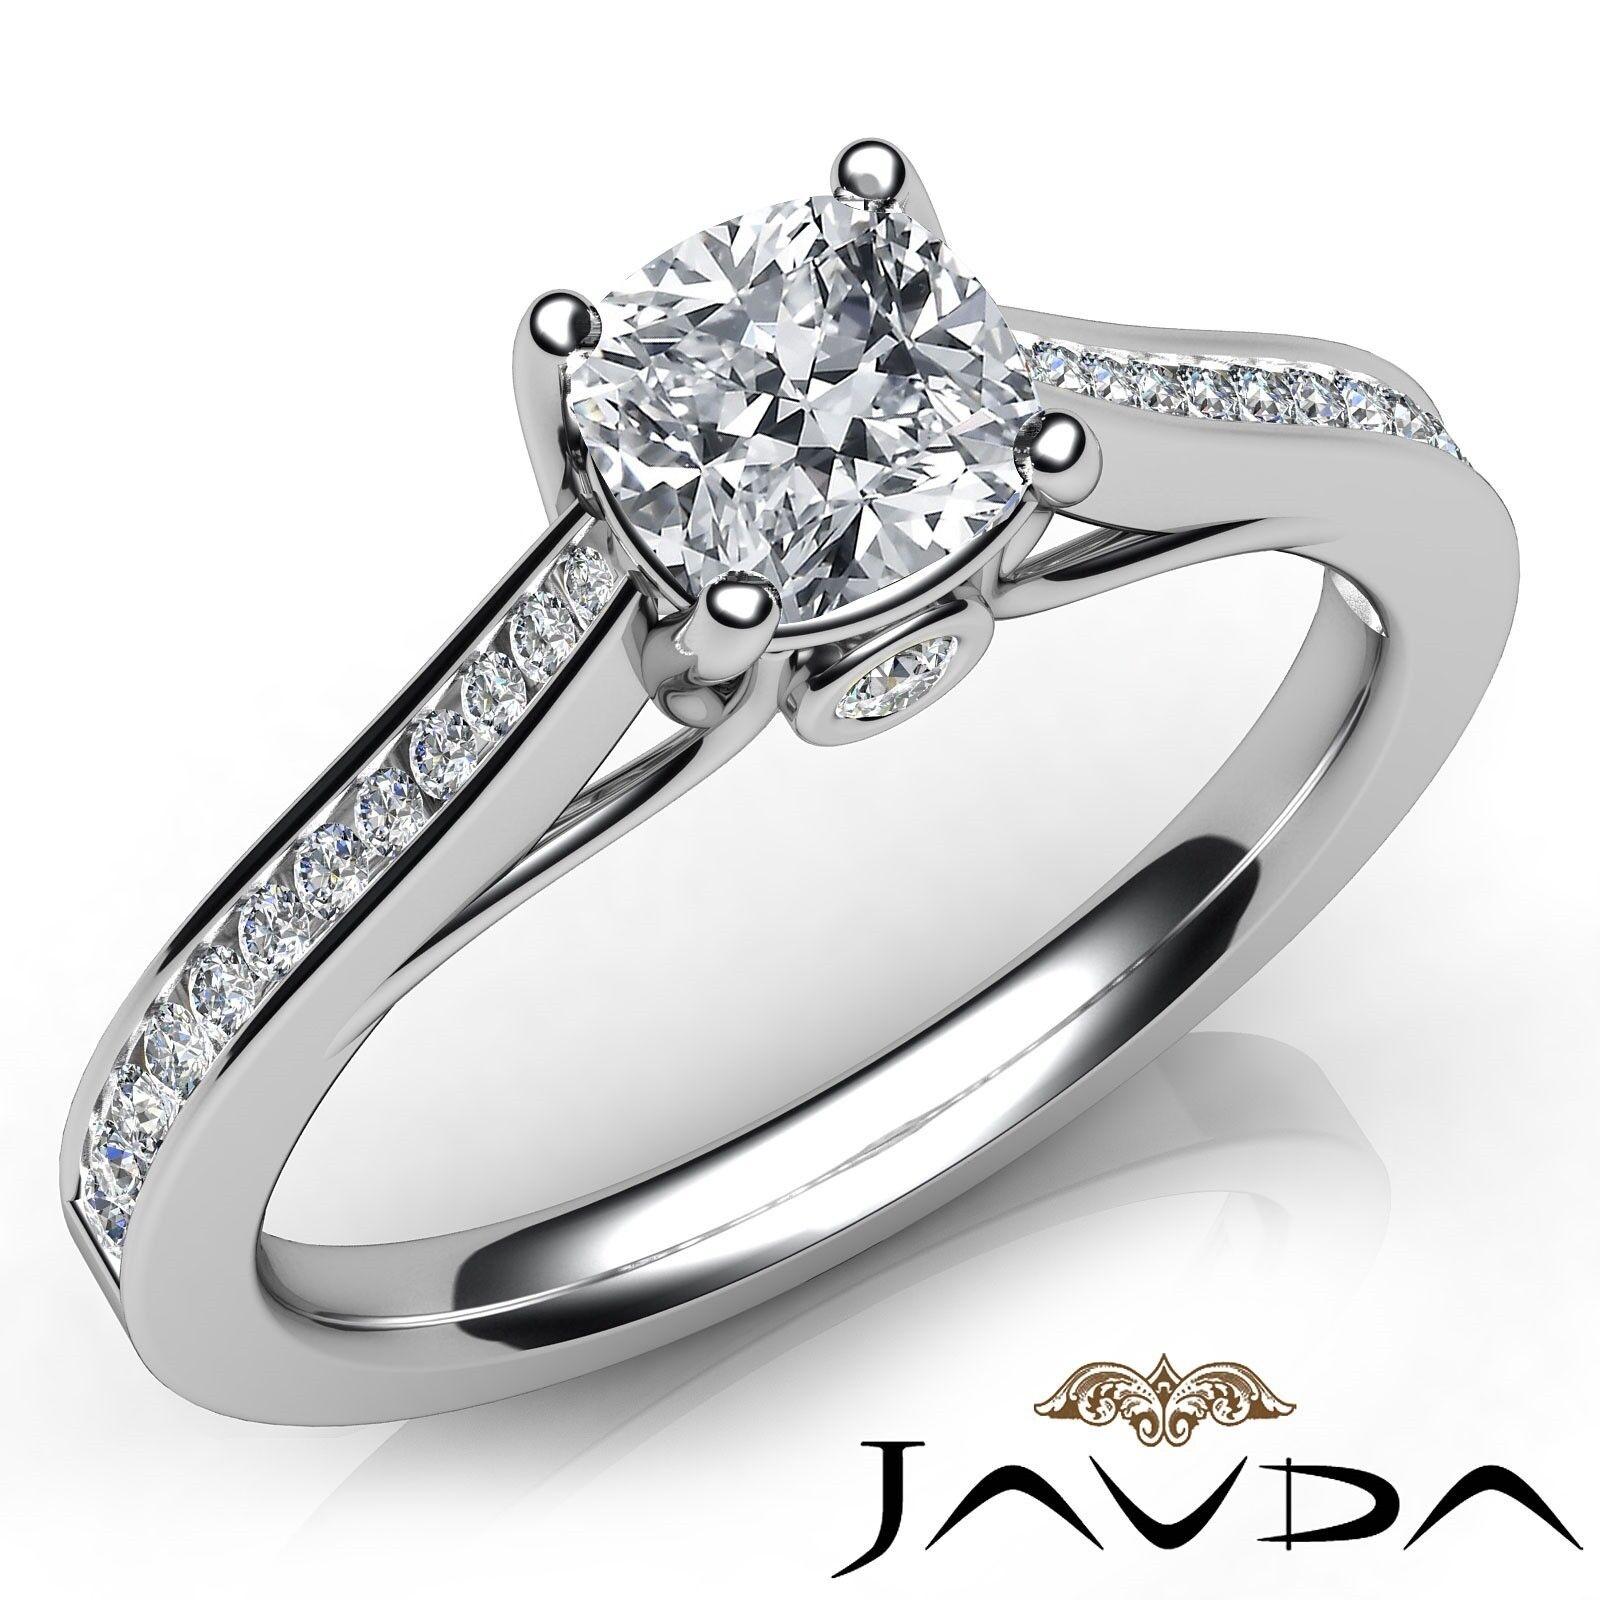 0.83ct Channel Bezel Prong Cushion Diamond Engagement Ring GIA F-VVS2 White Gold